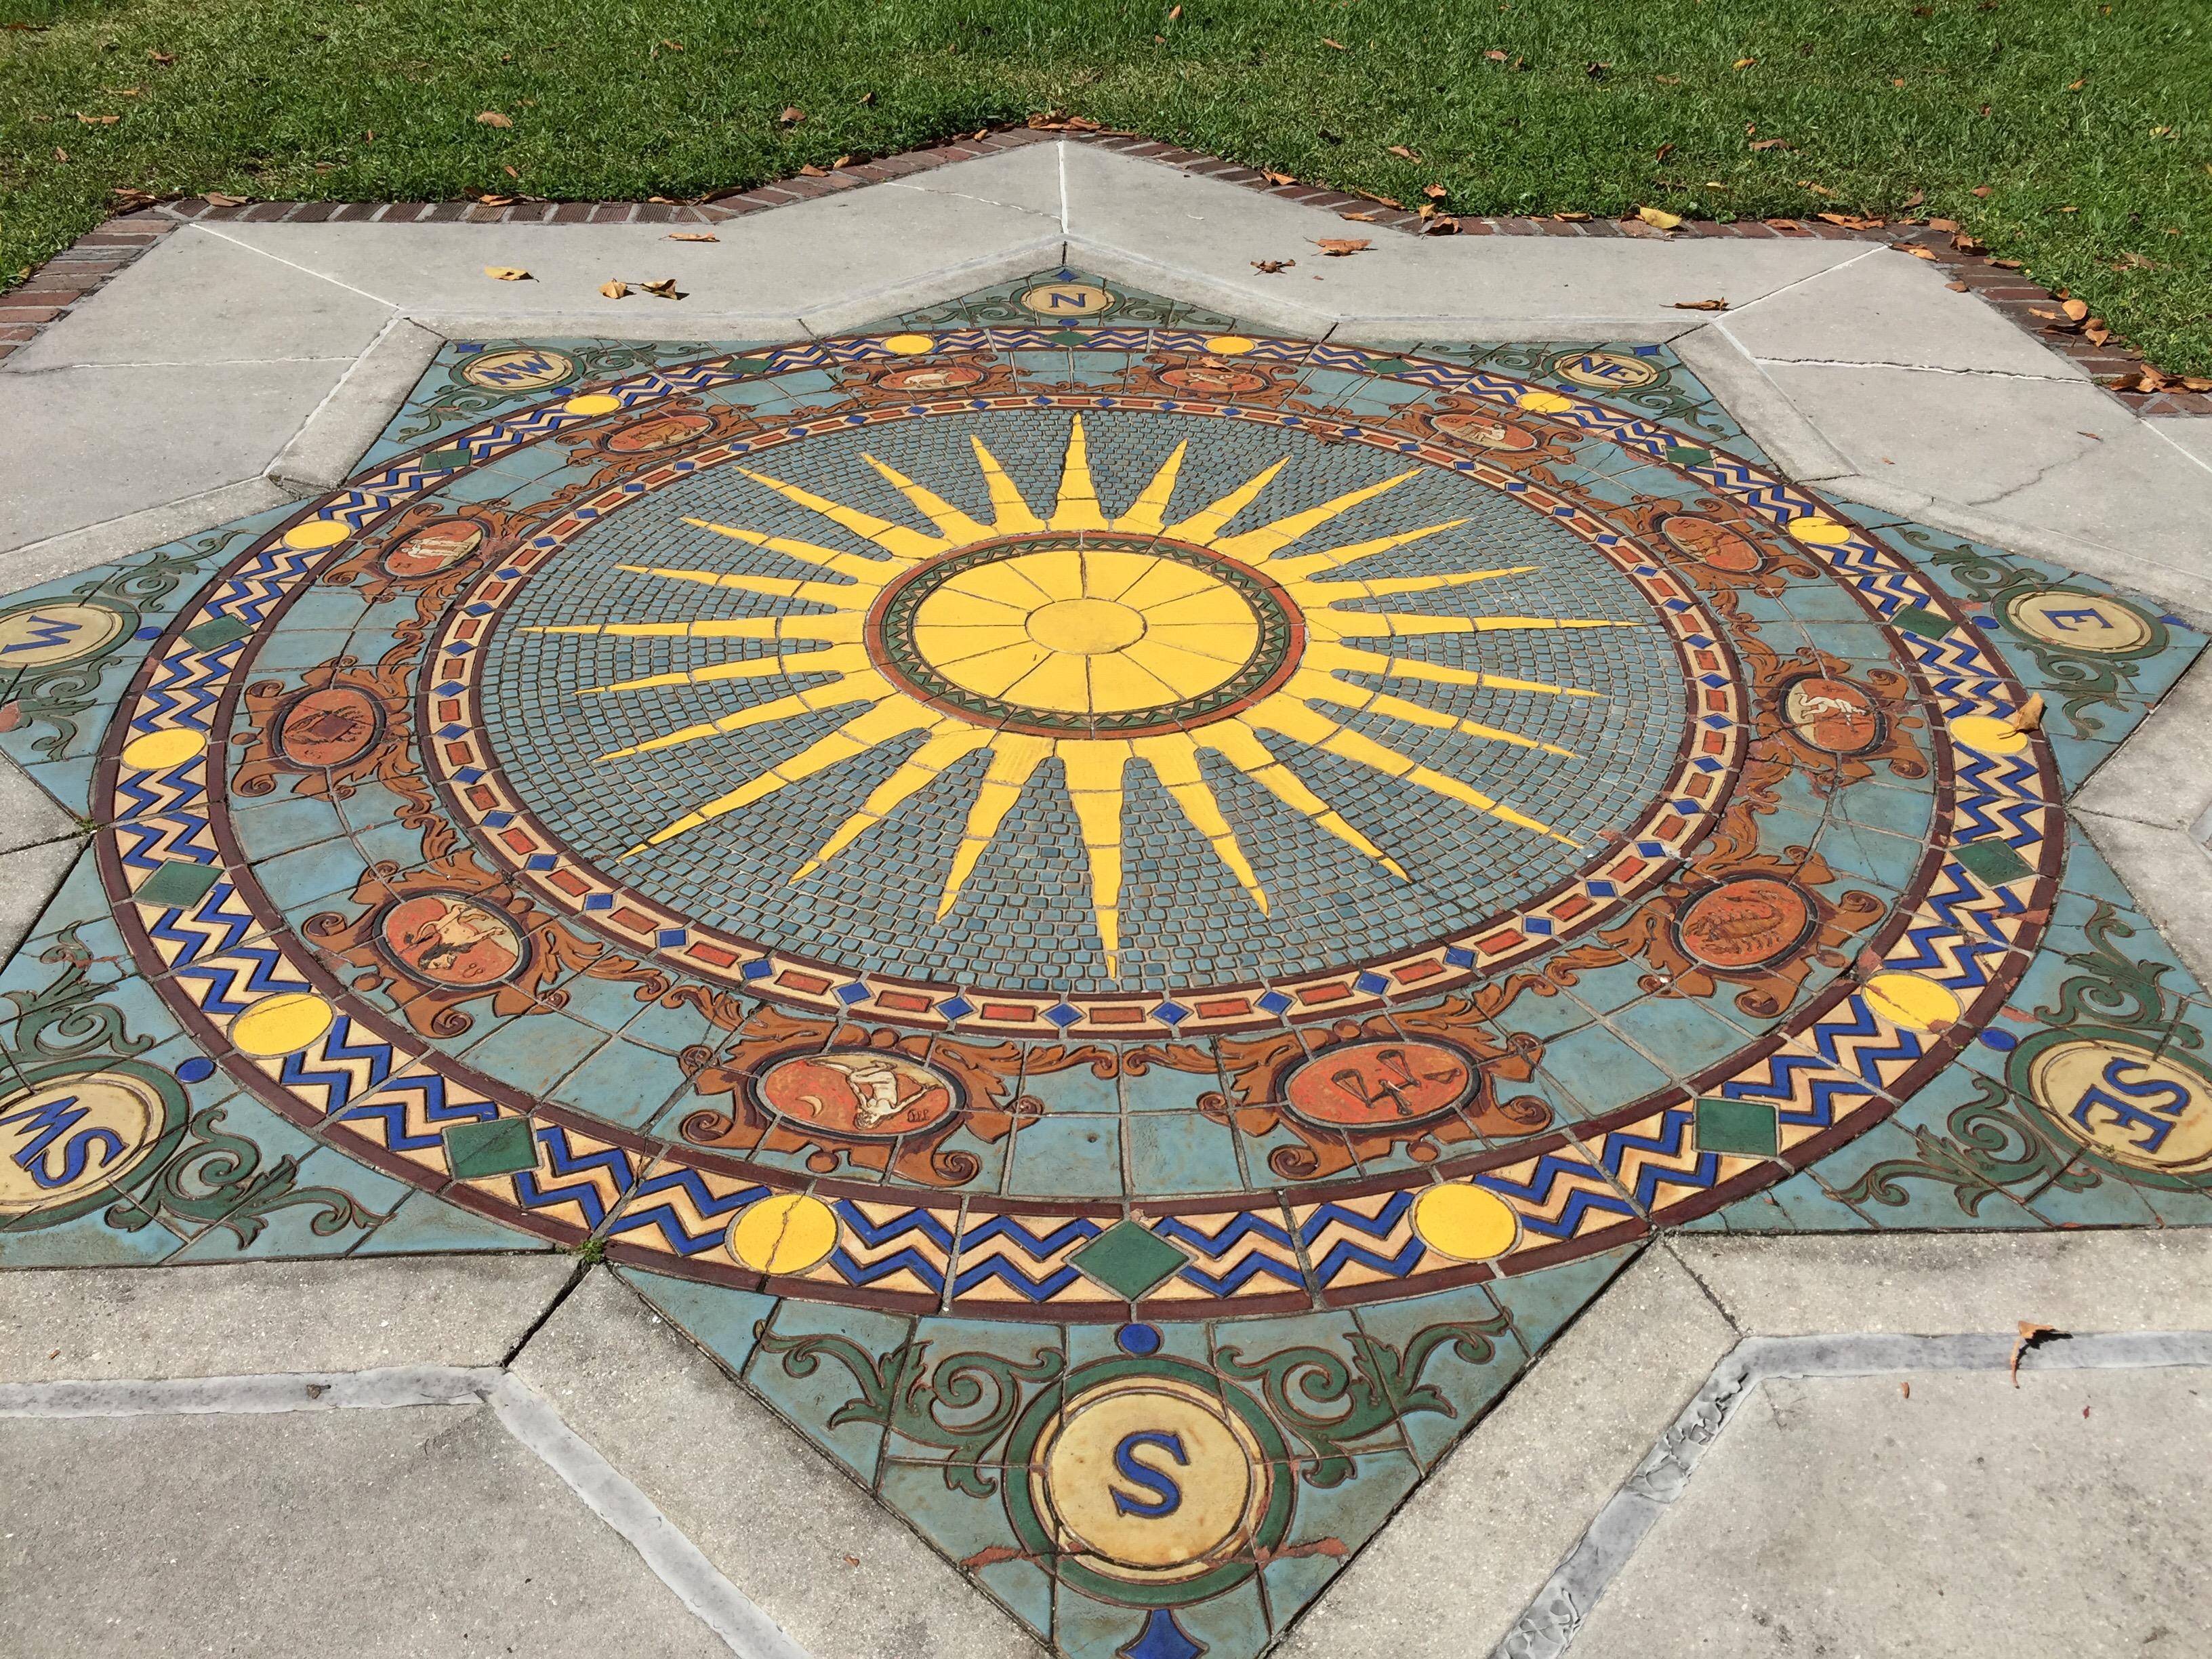 Ca' D' Zan, John Ringling, Ringling Estate, Sarasota, Ringling Circus, Mosaic, Tile